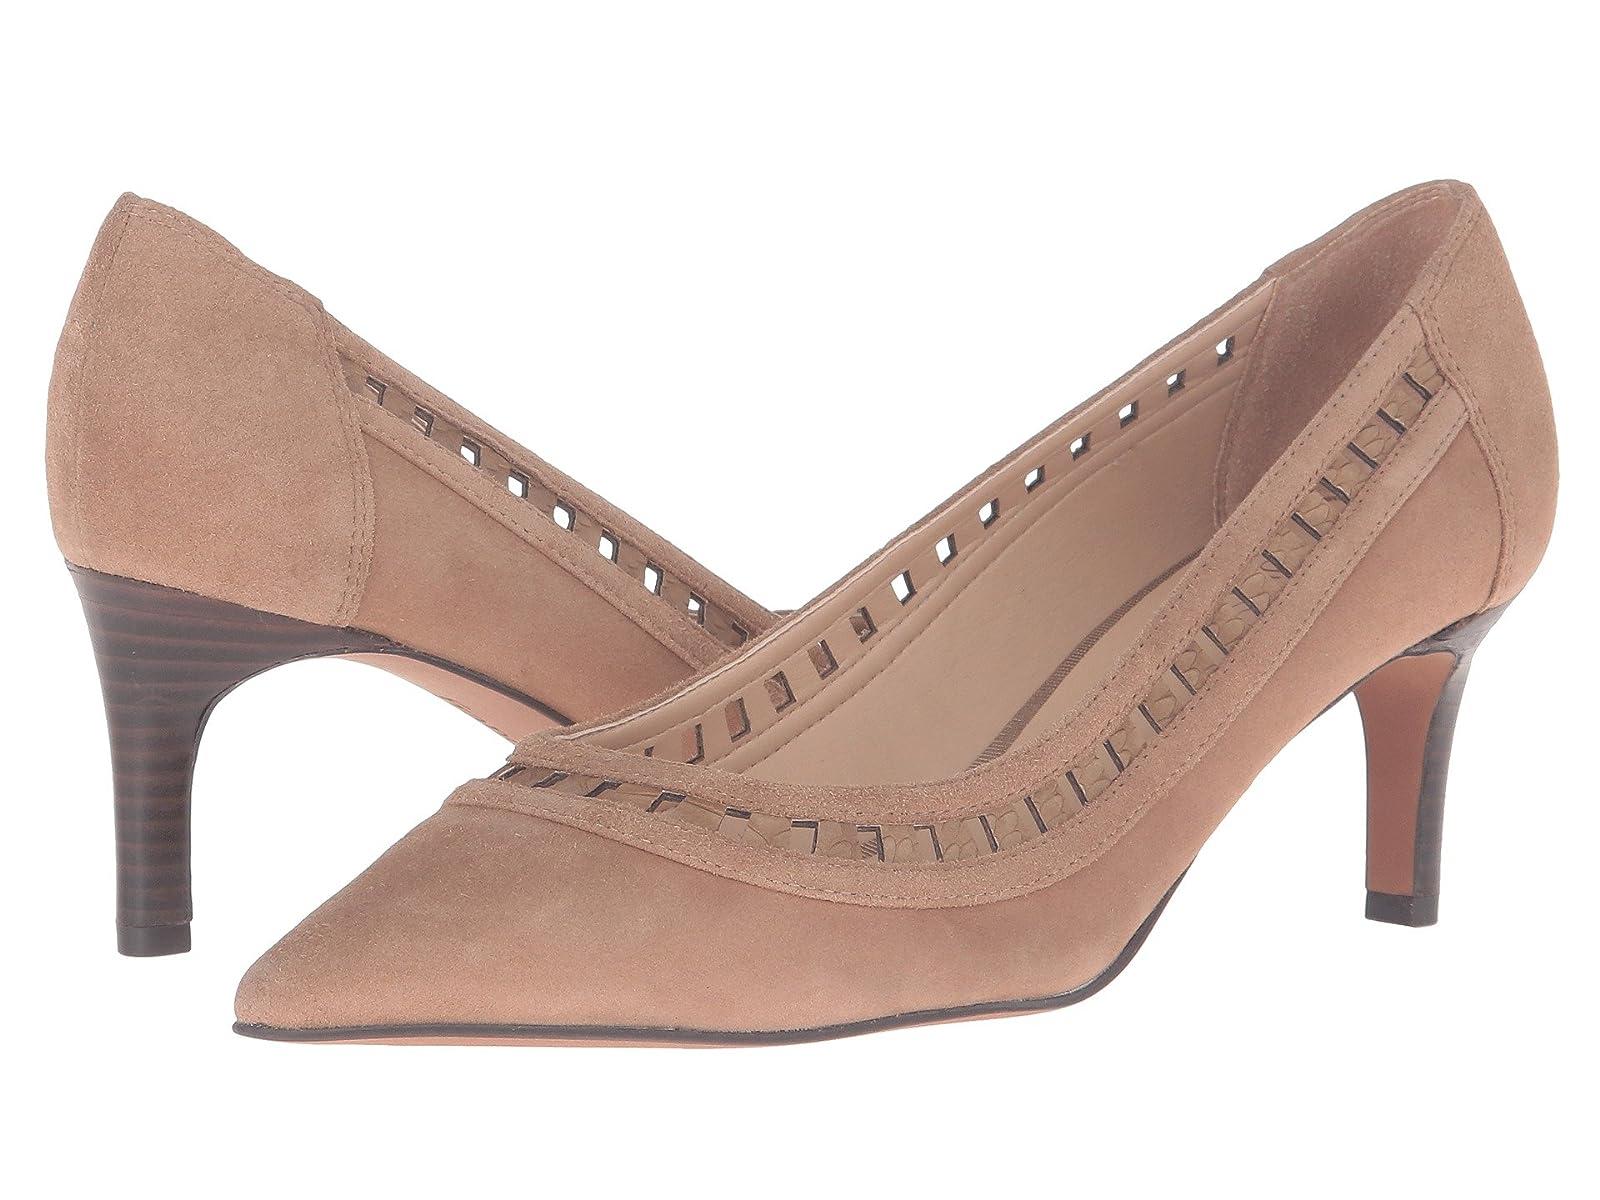 Franco Sarto DianeCheap and distinctive eye-catching shoes